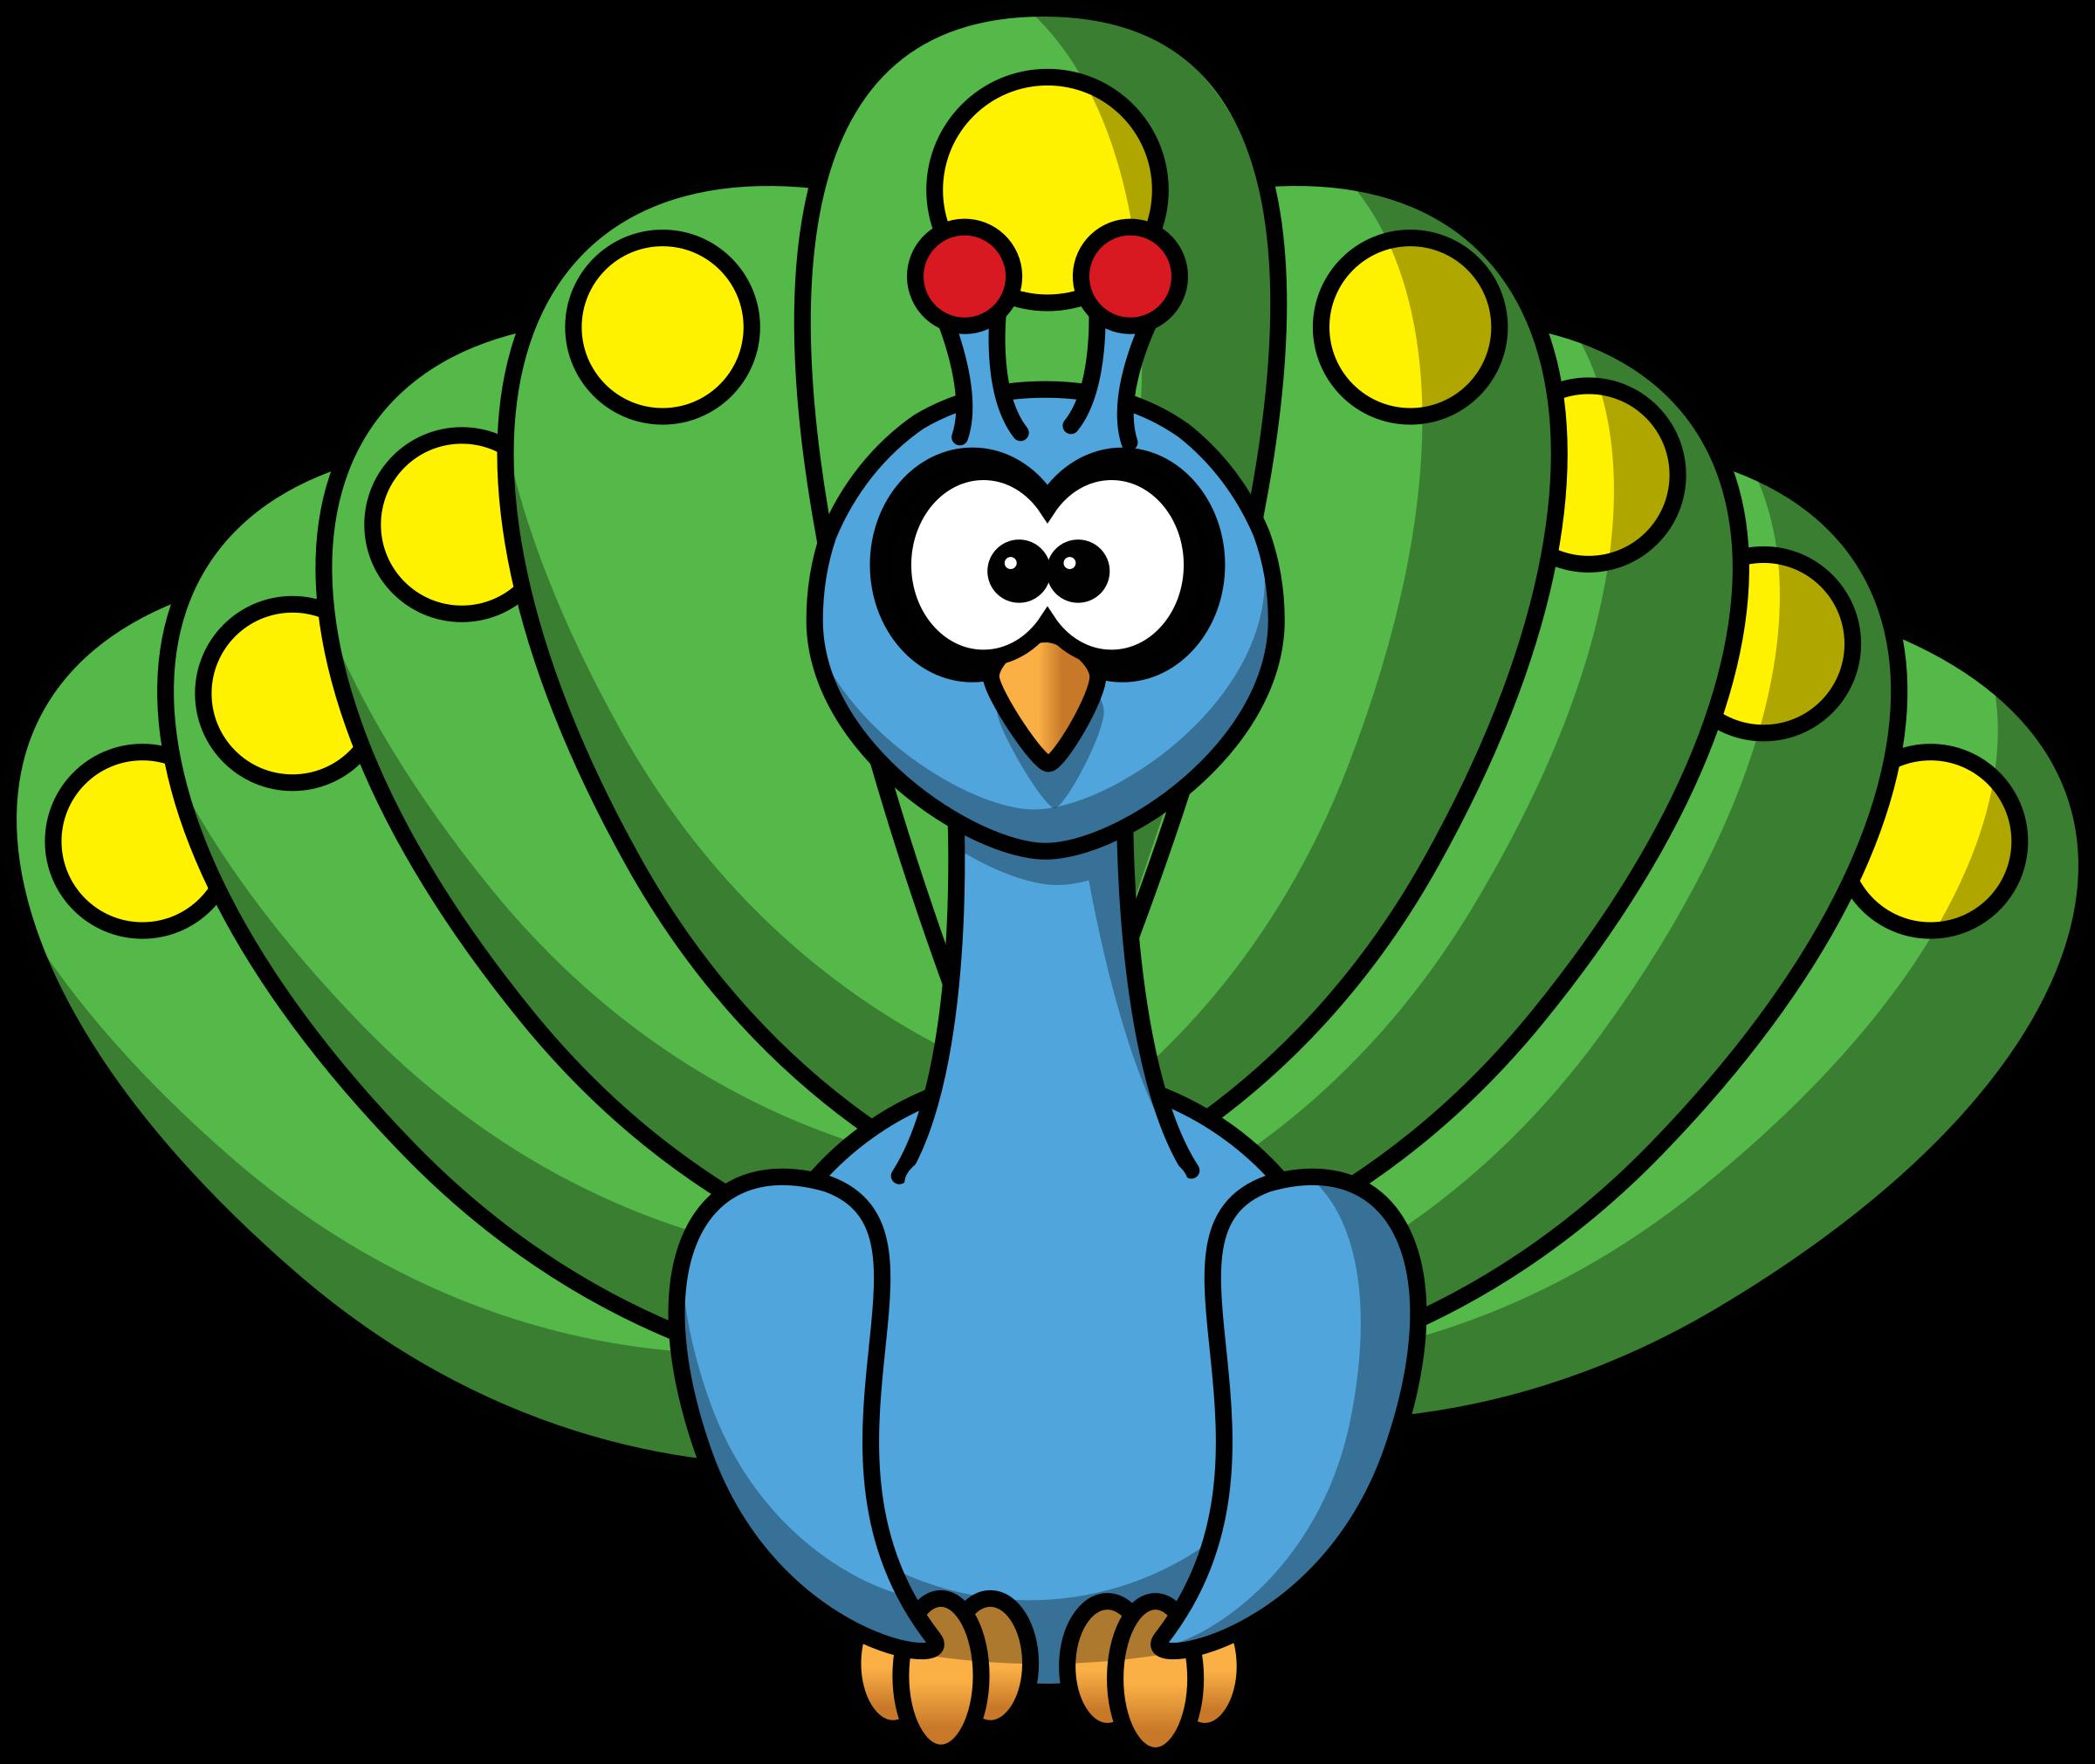 clipart freeuse stock Arcade clipart prizes. Cartoon peacock by studiofibonacci.